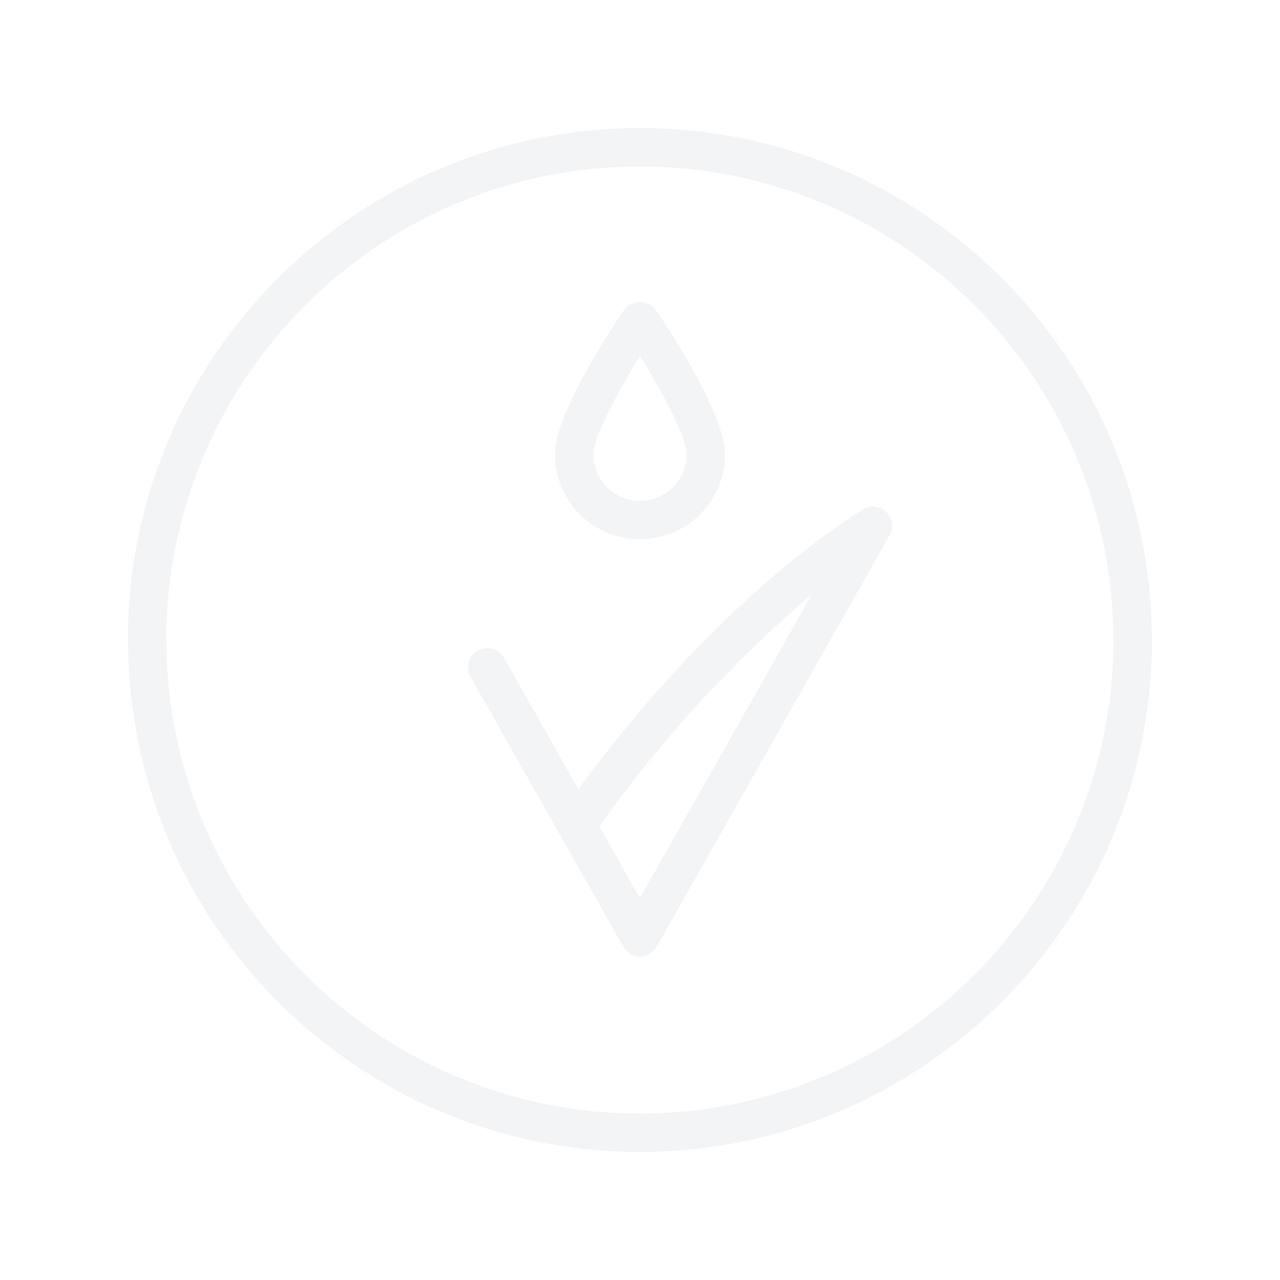 MIZON Joyful Time Essence Cucumber Mask 23g